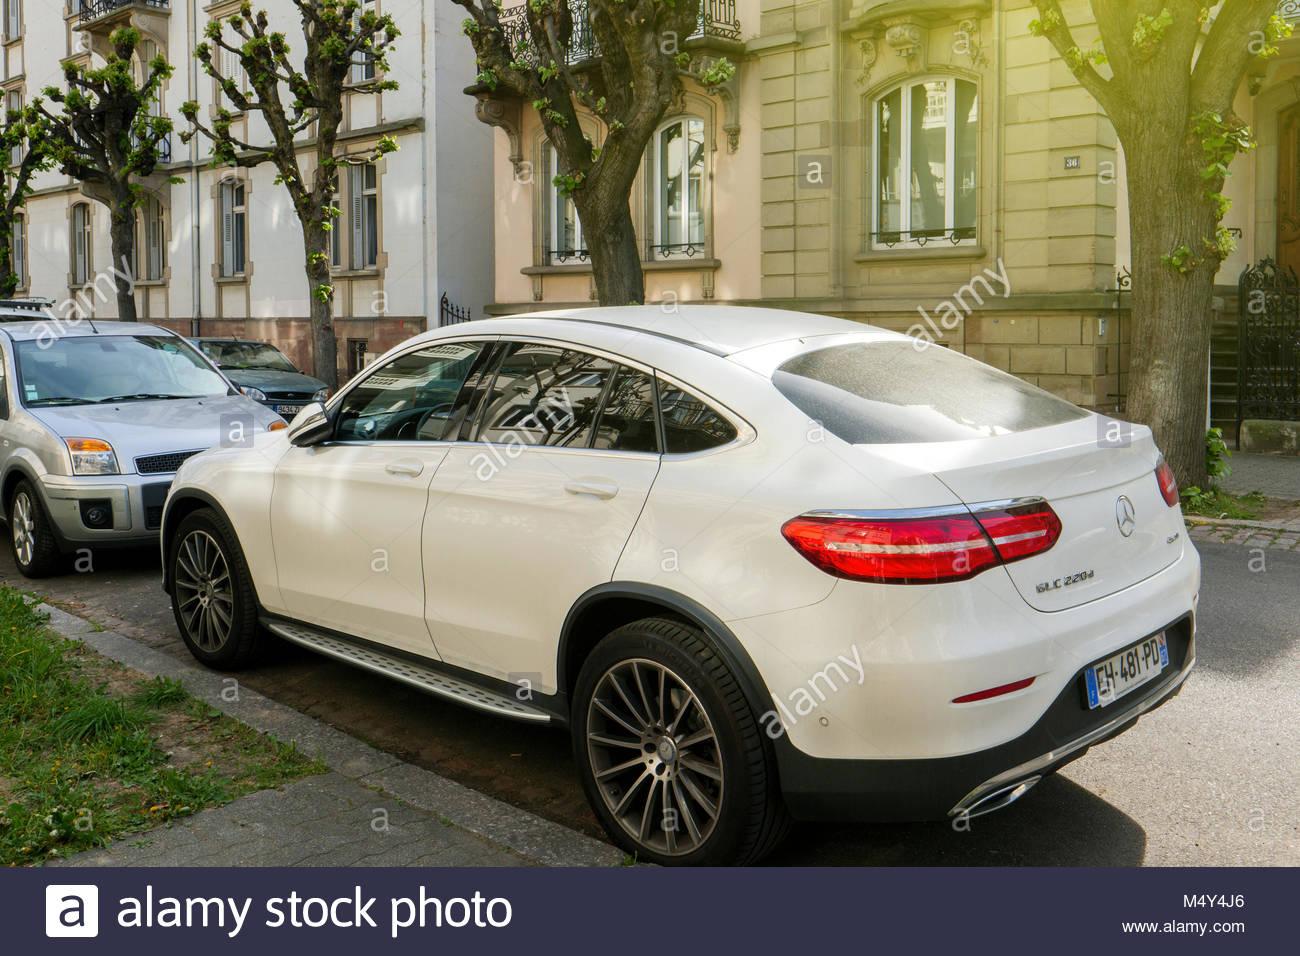 Mercedes Benz GLC 220d - Stock Image